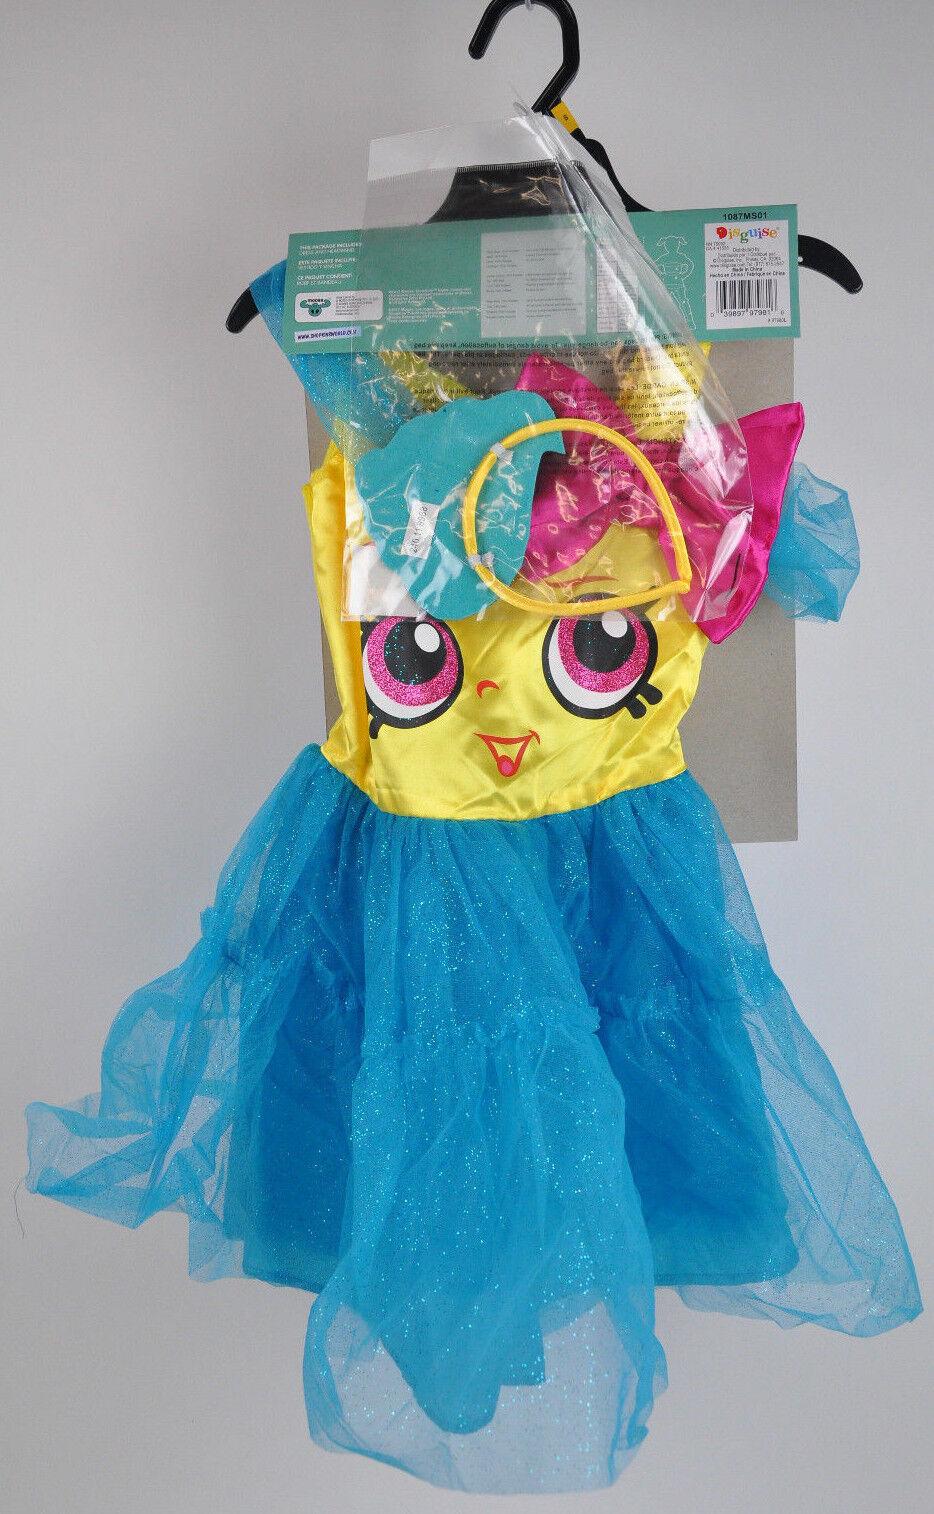 New SHOPKINS Cupcake Queen COSTUME Dress UP Dress SET Headband Headband Headband NWT Sz SMALL 4-6x 5e6880